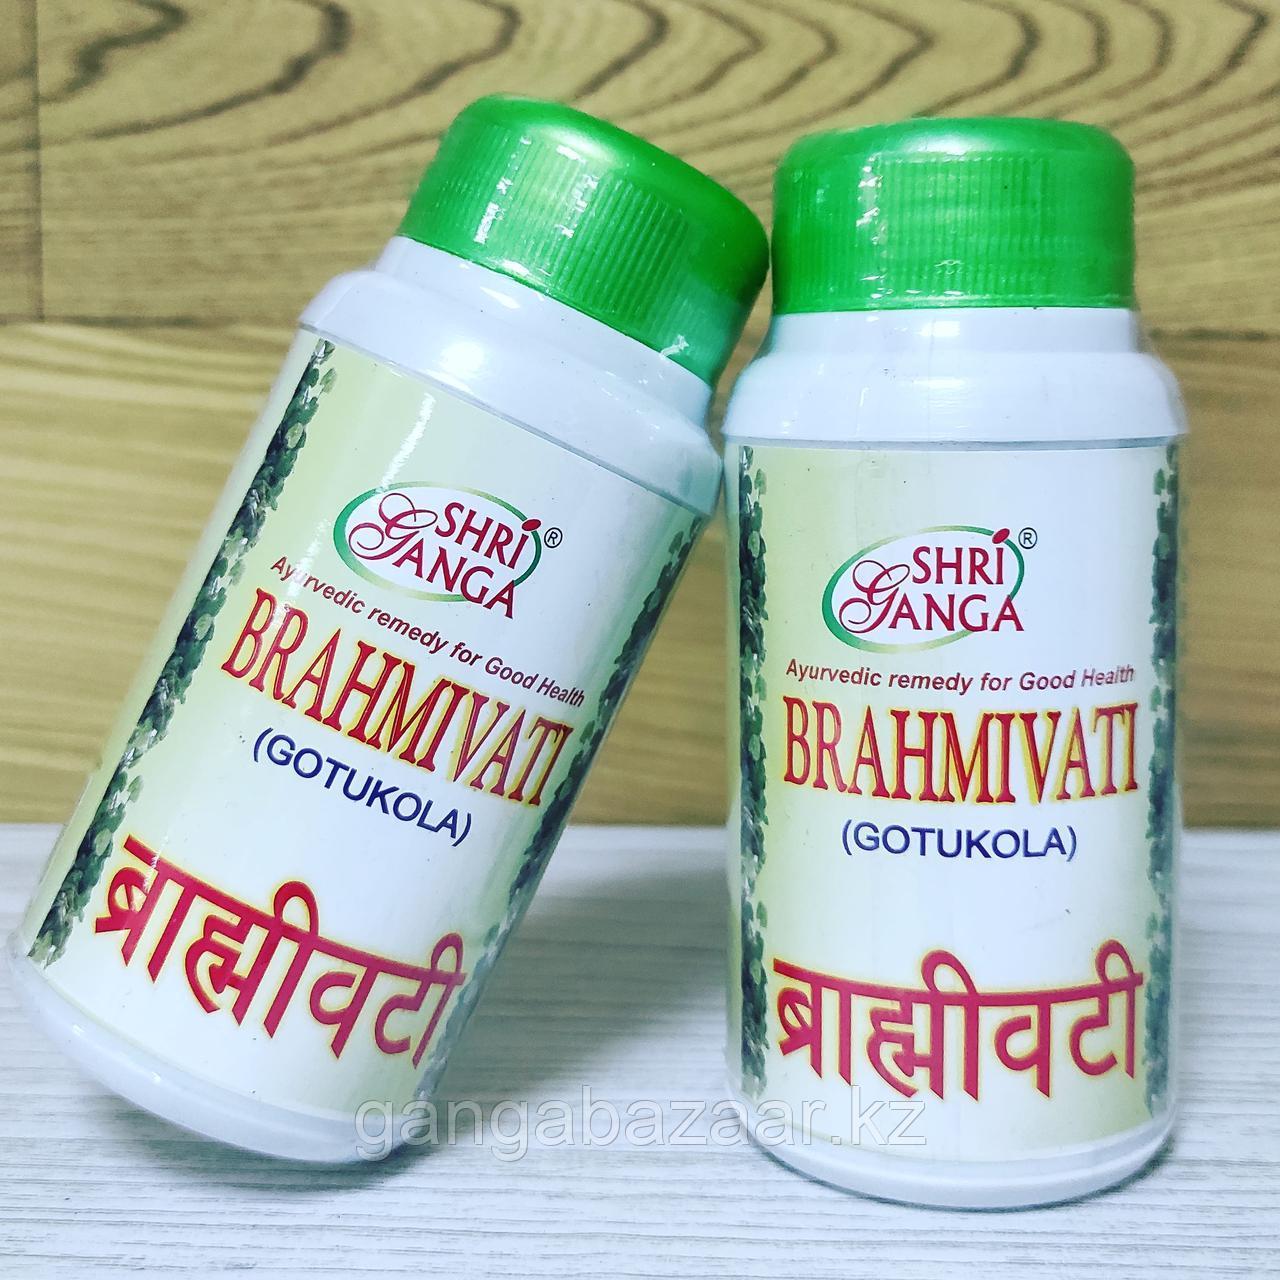 Брахми вати или Брами вати (Brahmi vati Gotukola Shri Ganga) - для головного мозга, нервной системы,